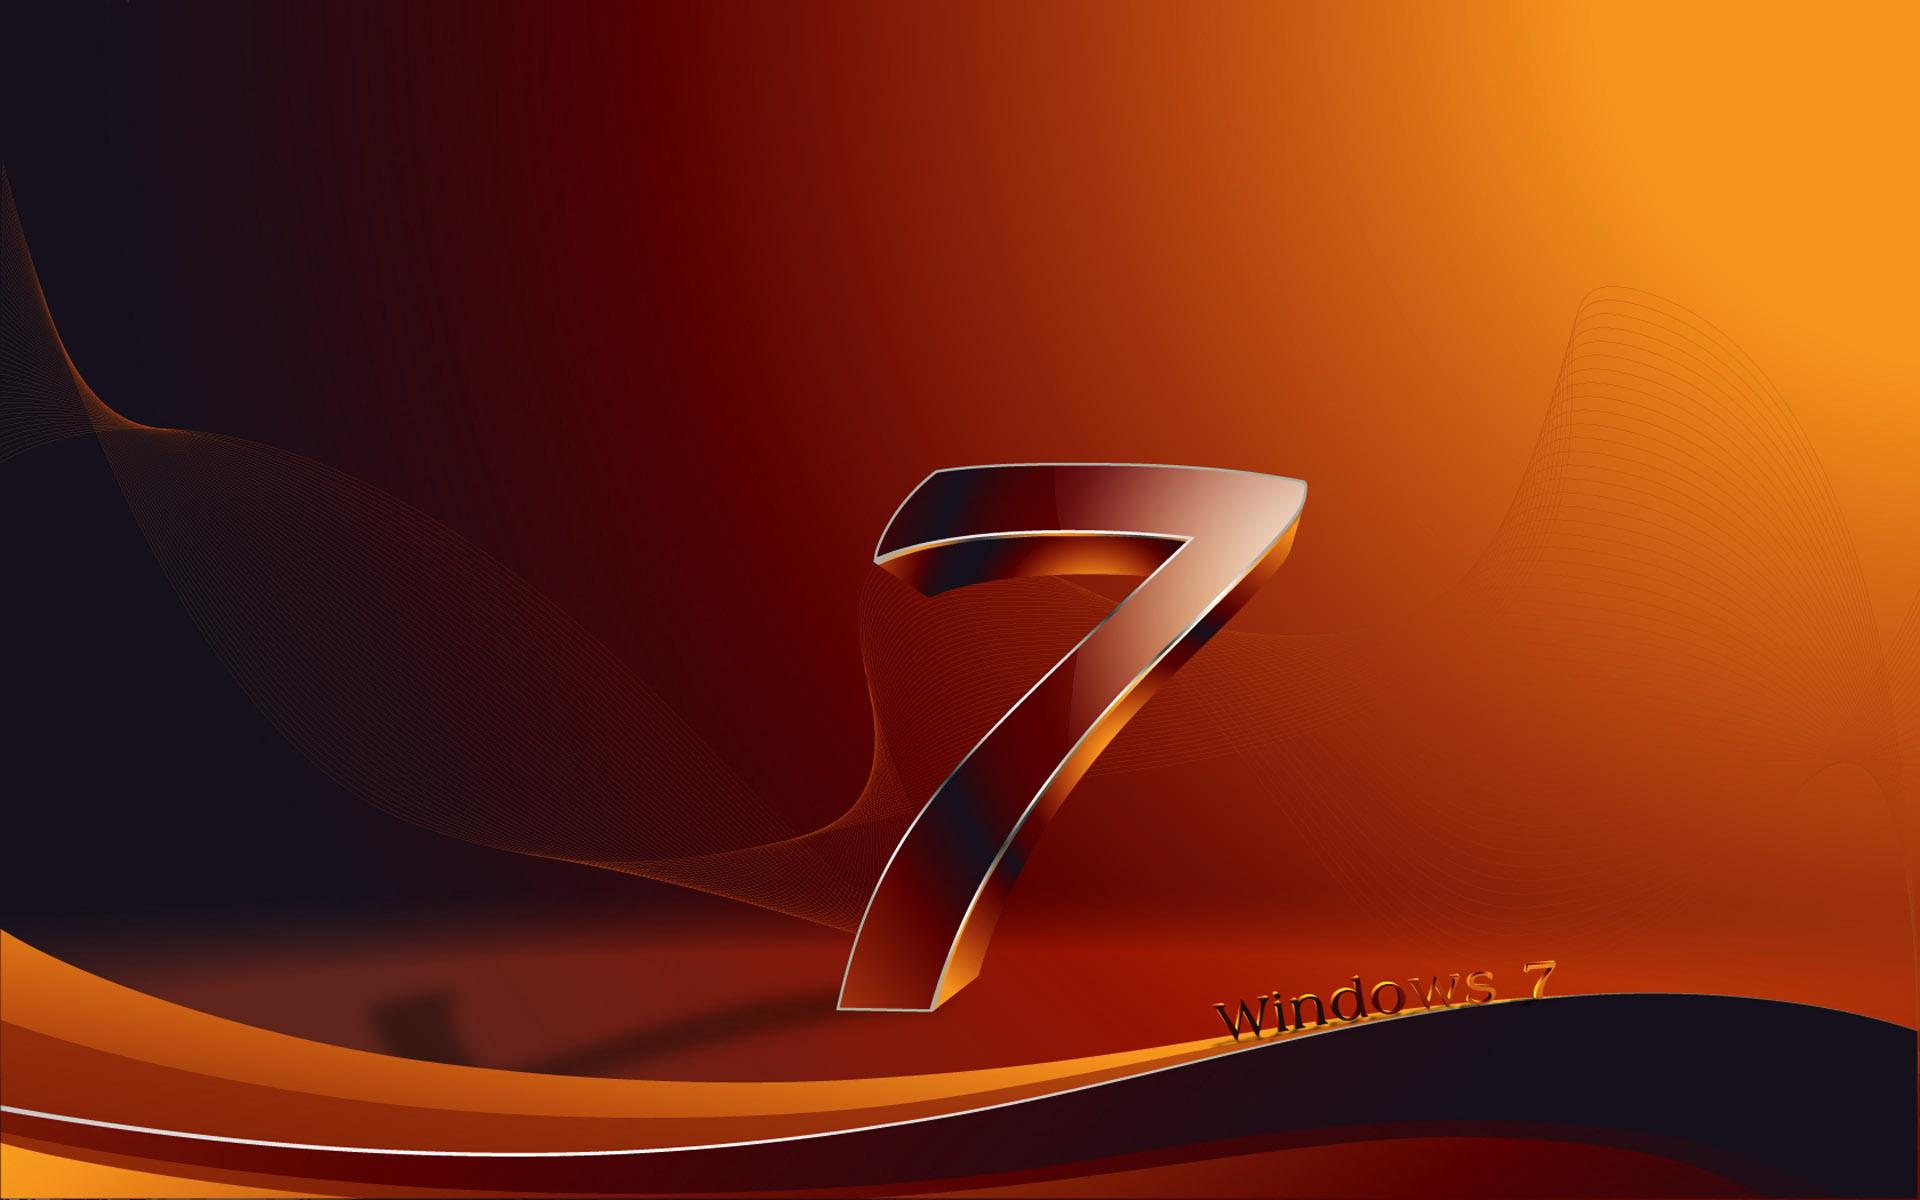 3D Windows 7 Wallpapers HD Wallpapers 1920x1200